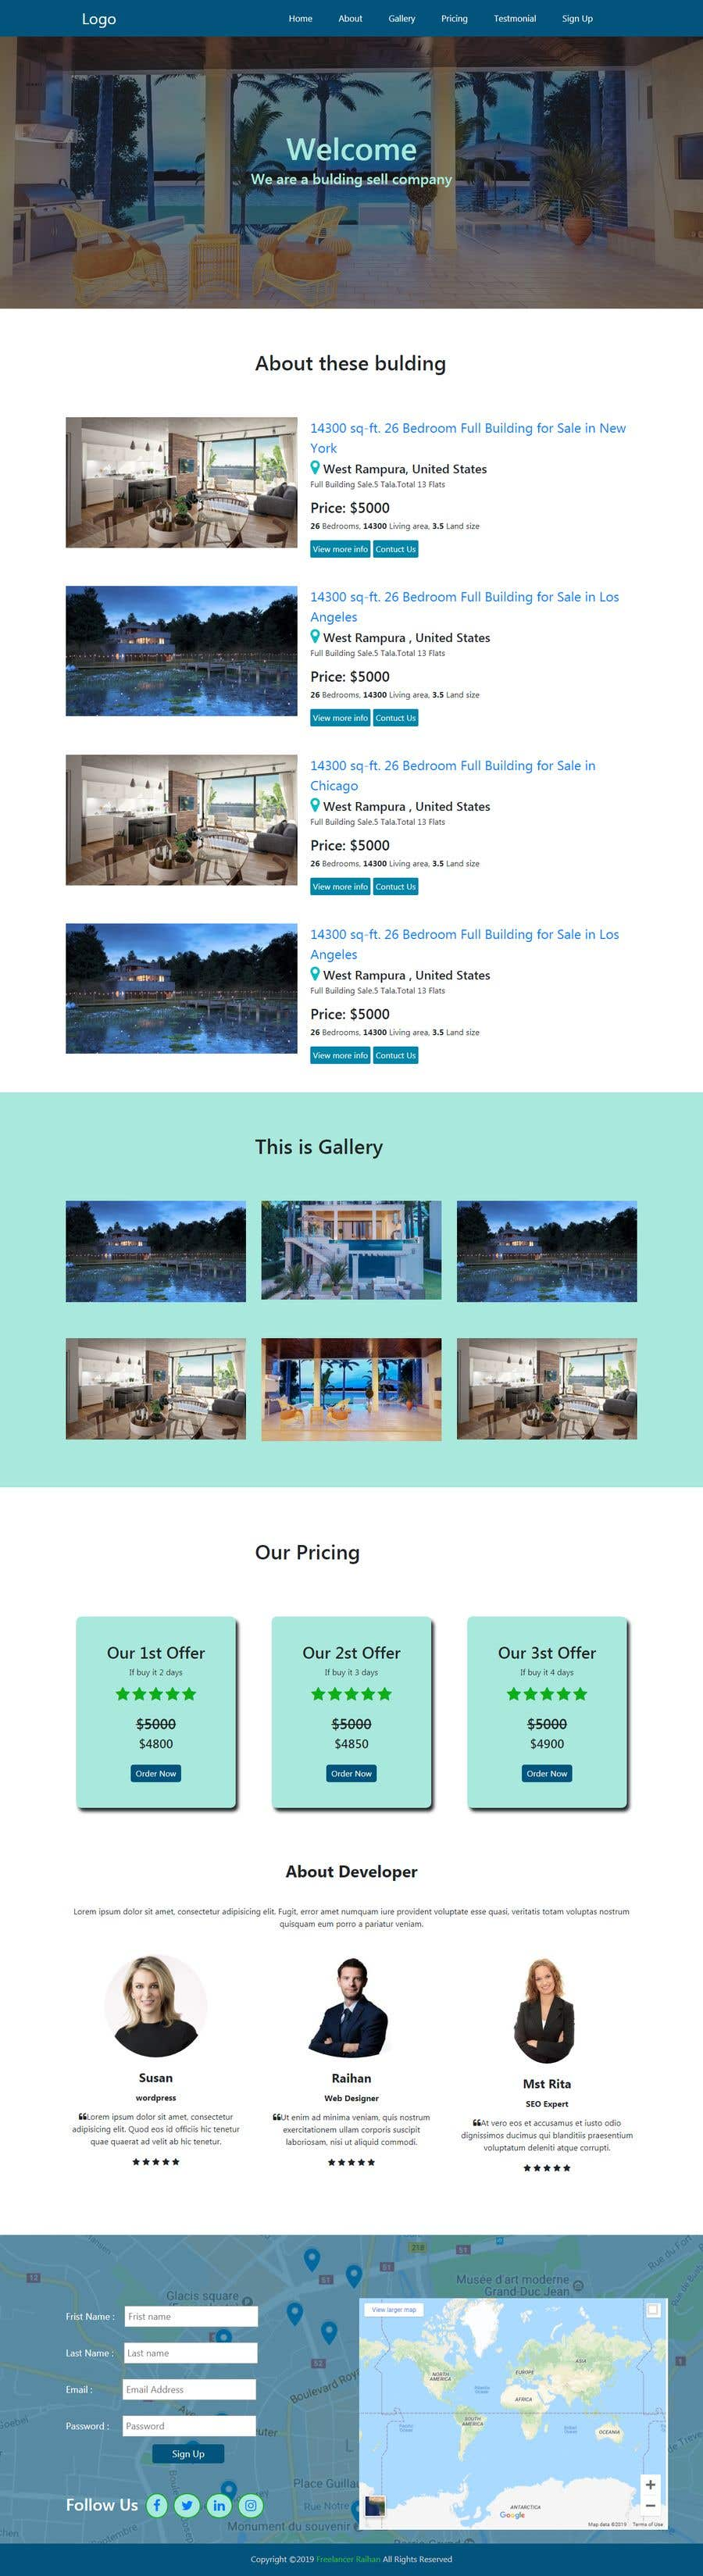 Penyertaan Peraduan #17 untuk Website Design & Layout - 2 Page Design